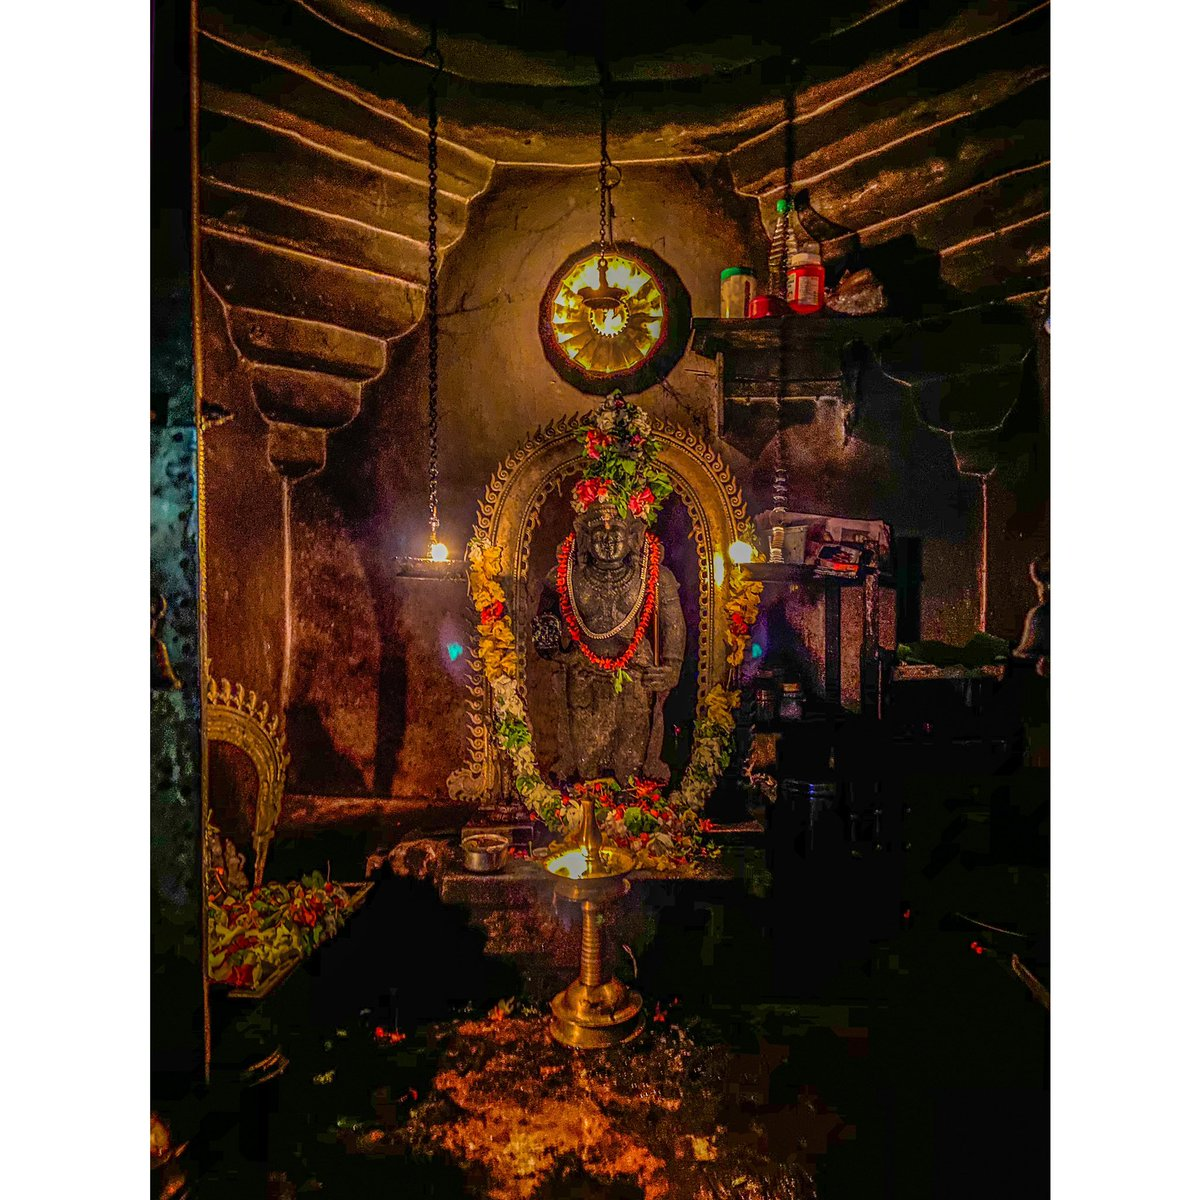 सर्वधर्मान्परित्यज्य मामेकं शरणं व्रज   अहं त्वां सर्वपापेभ्यो मोक्षयिष्यामि मा शुच:     A picture of the deity from my village temple in #thrissur #kerala  #keralagram  #hinduism #krsna #photographypic.twitter.com/ouPD4Cha5u – at Village Office, Vellangalloor